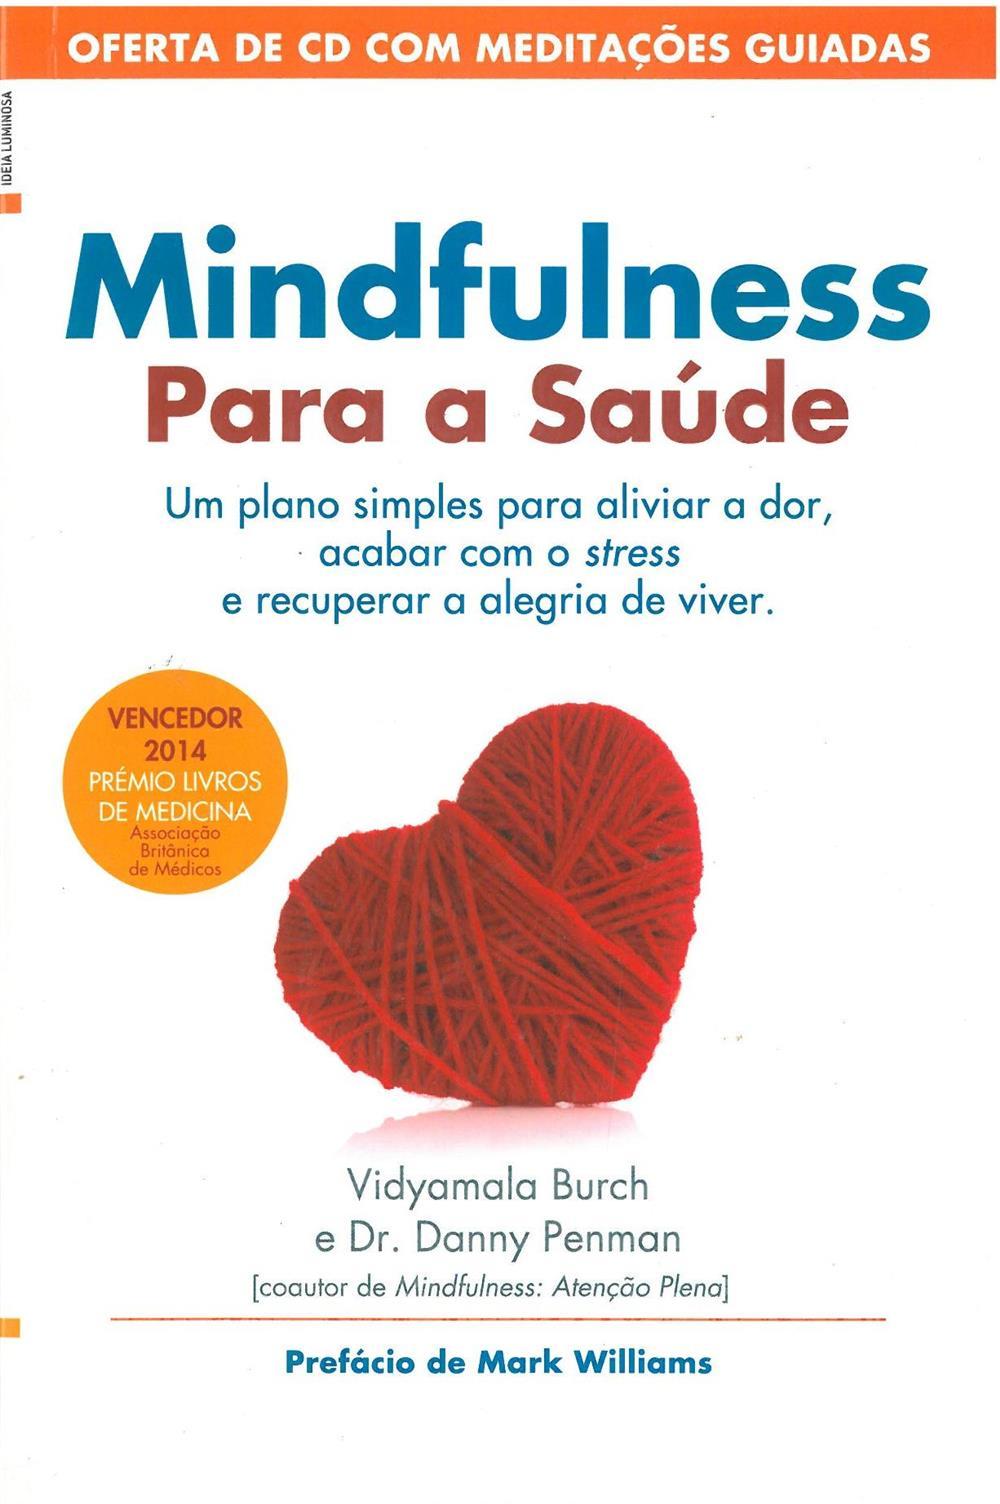 Mindfulness para a saúde_.jpg